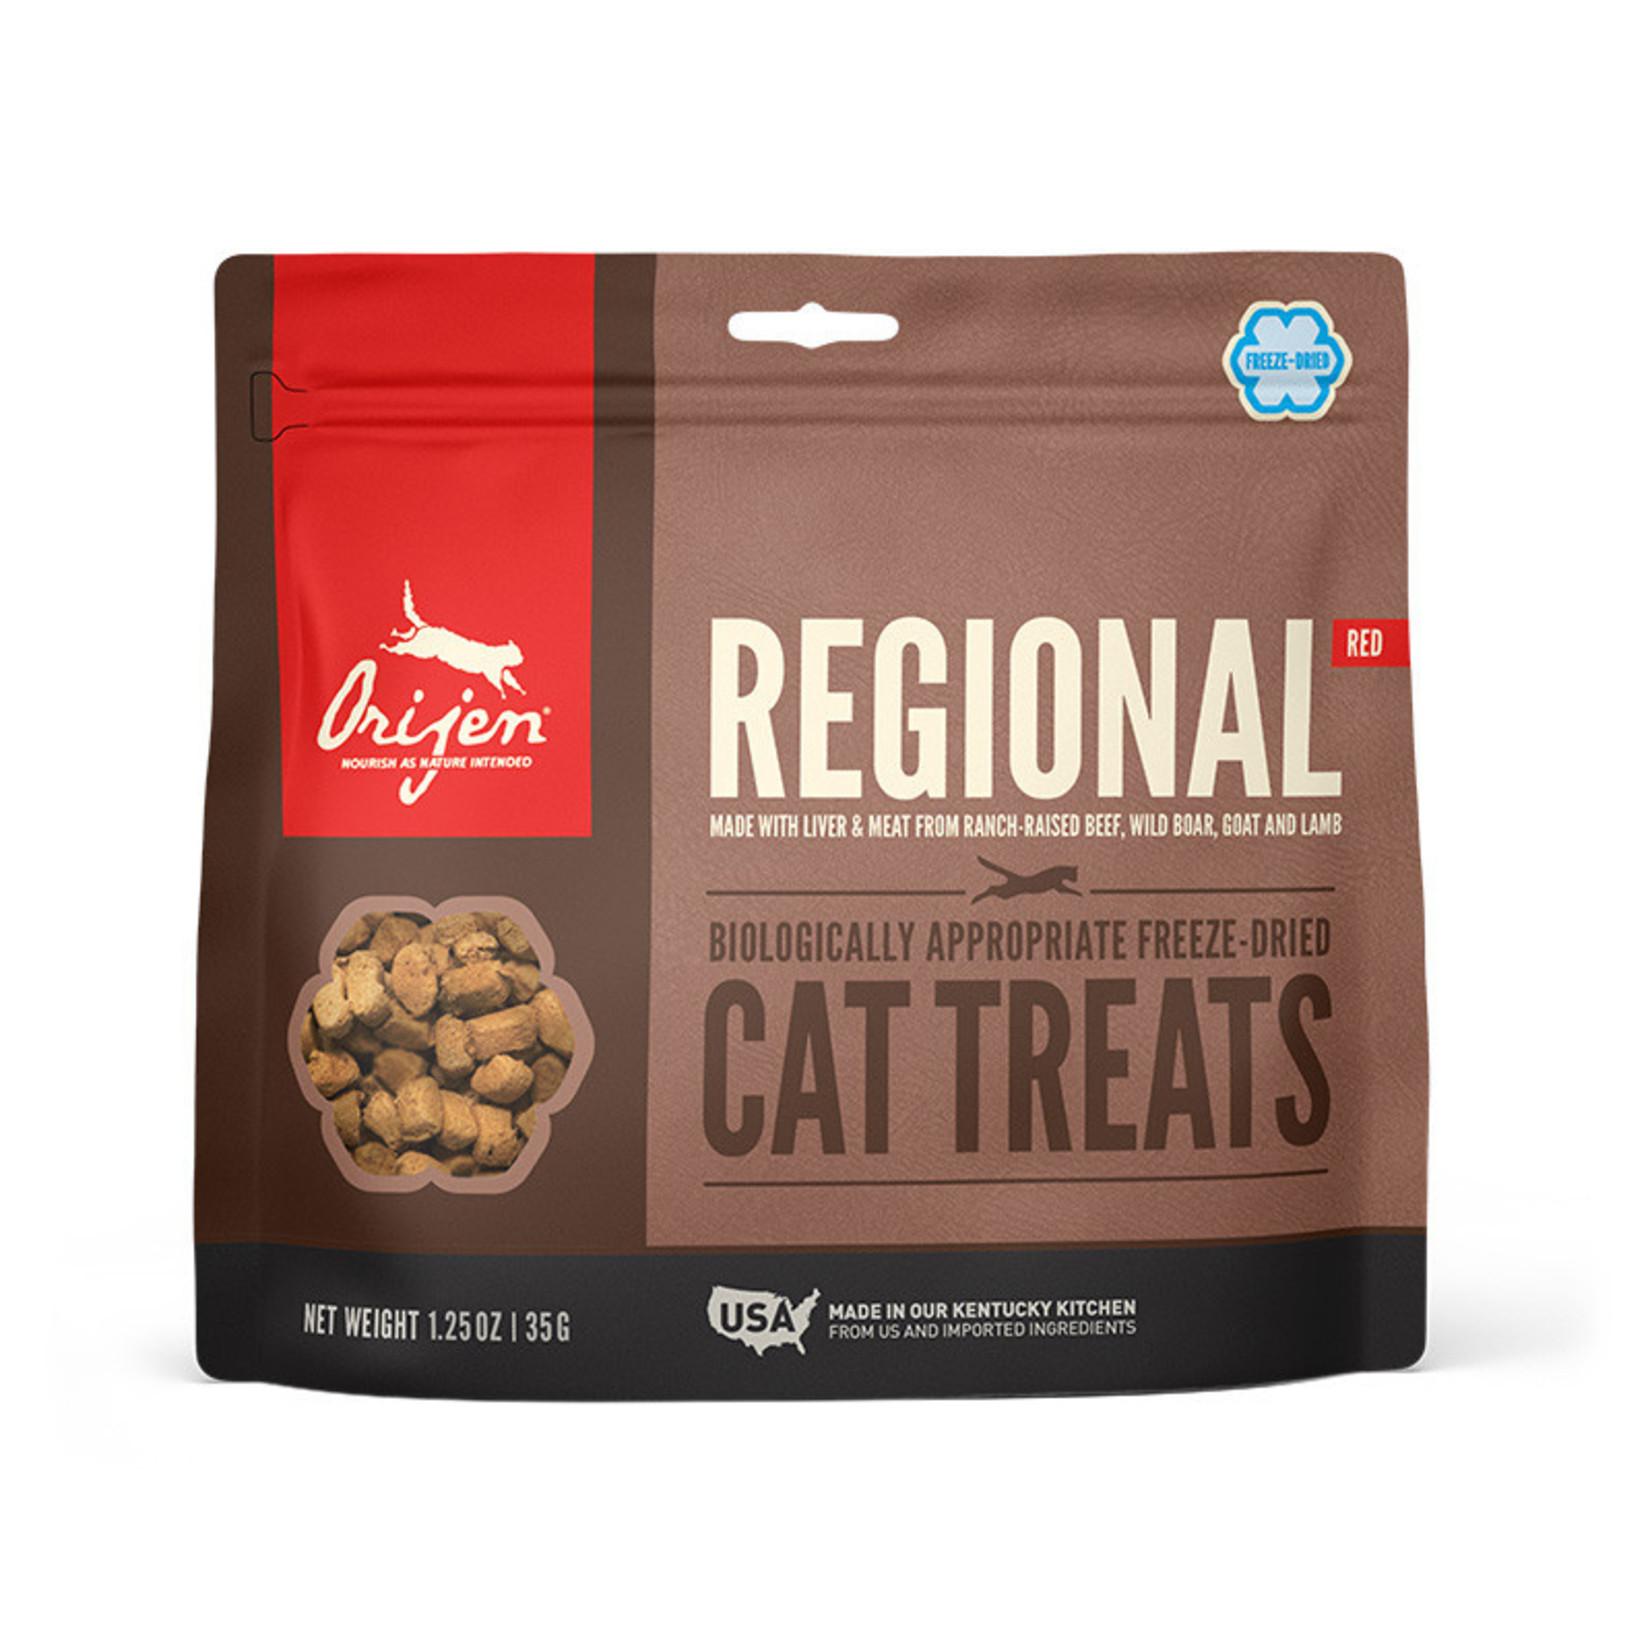 Champion Pet Foods Orijen Cat Freeze-dried Regional Red Treat 1.25 OZ